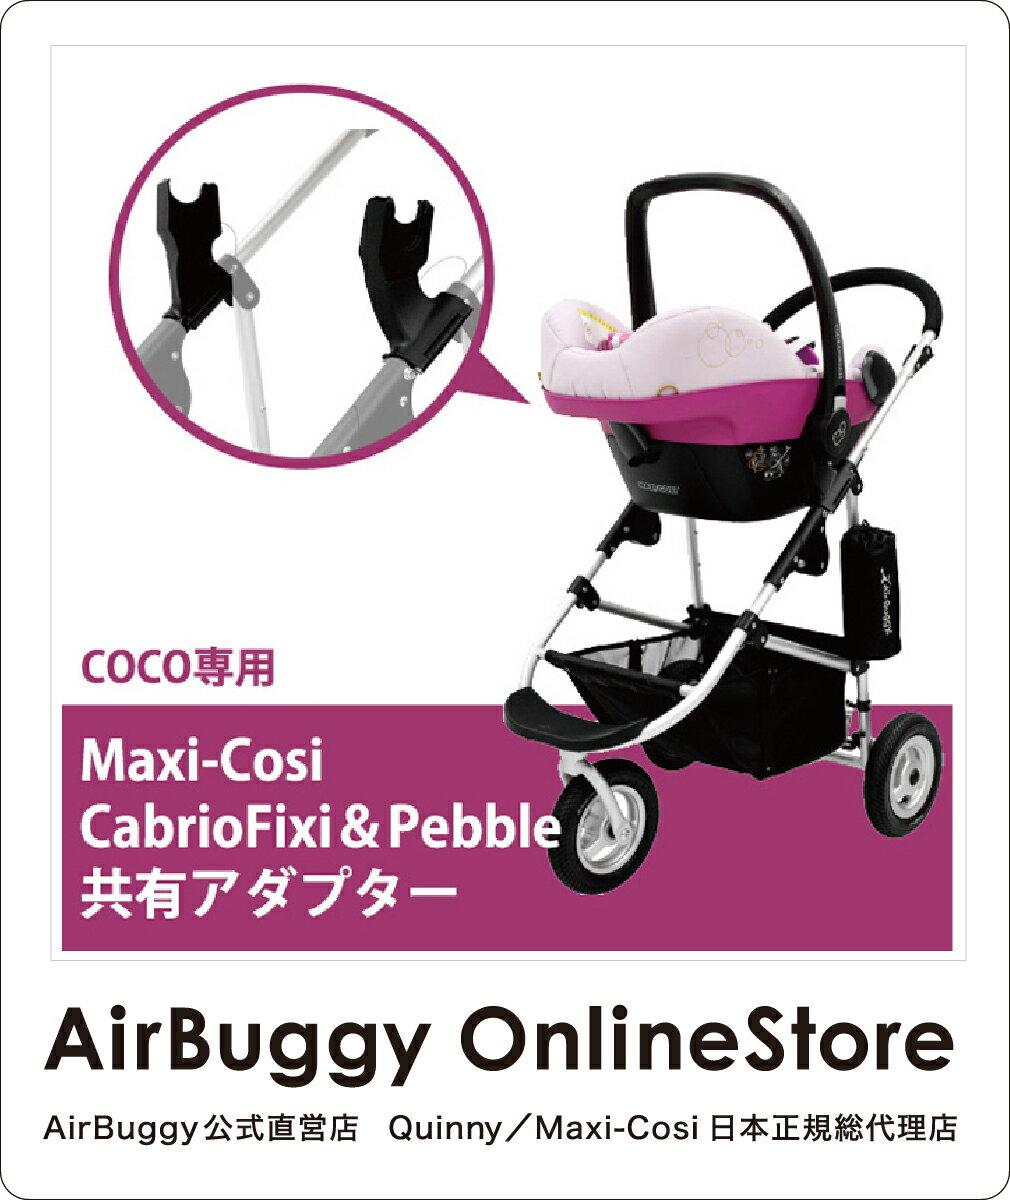 AirBuggy 嬰兒推車Maxi-cosi 連接器(預購)